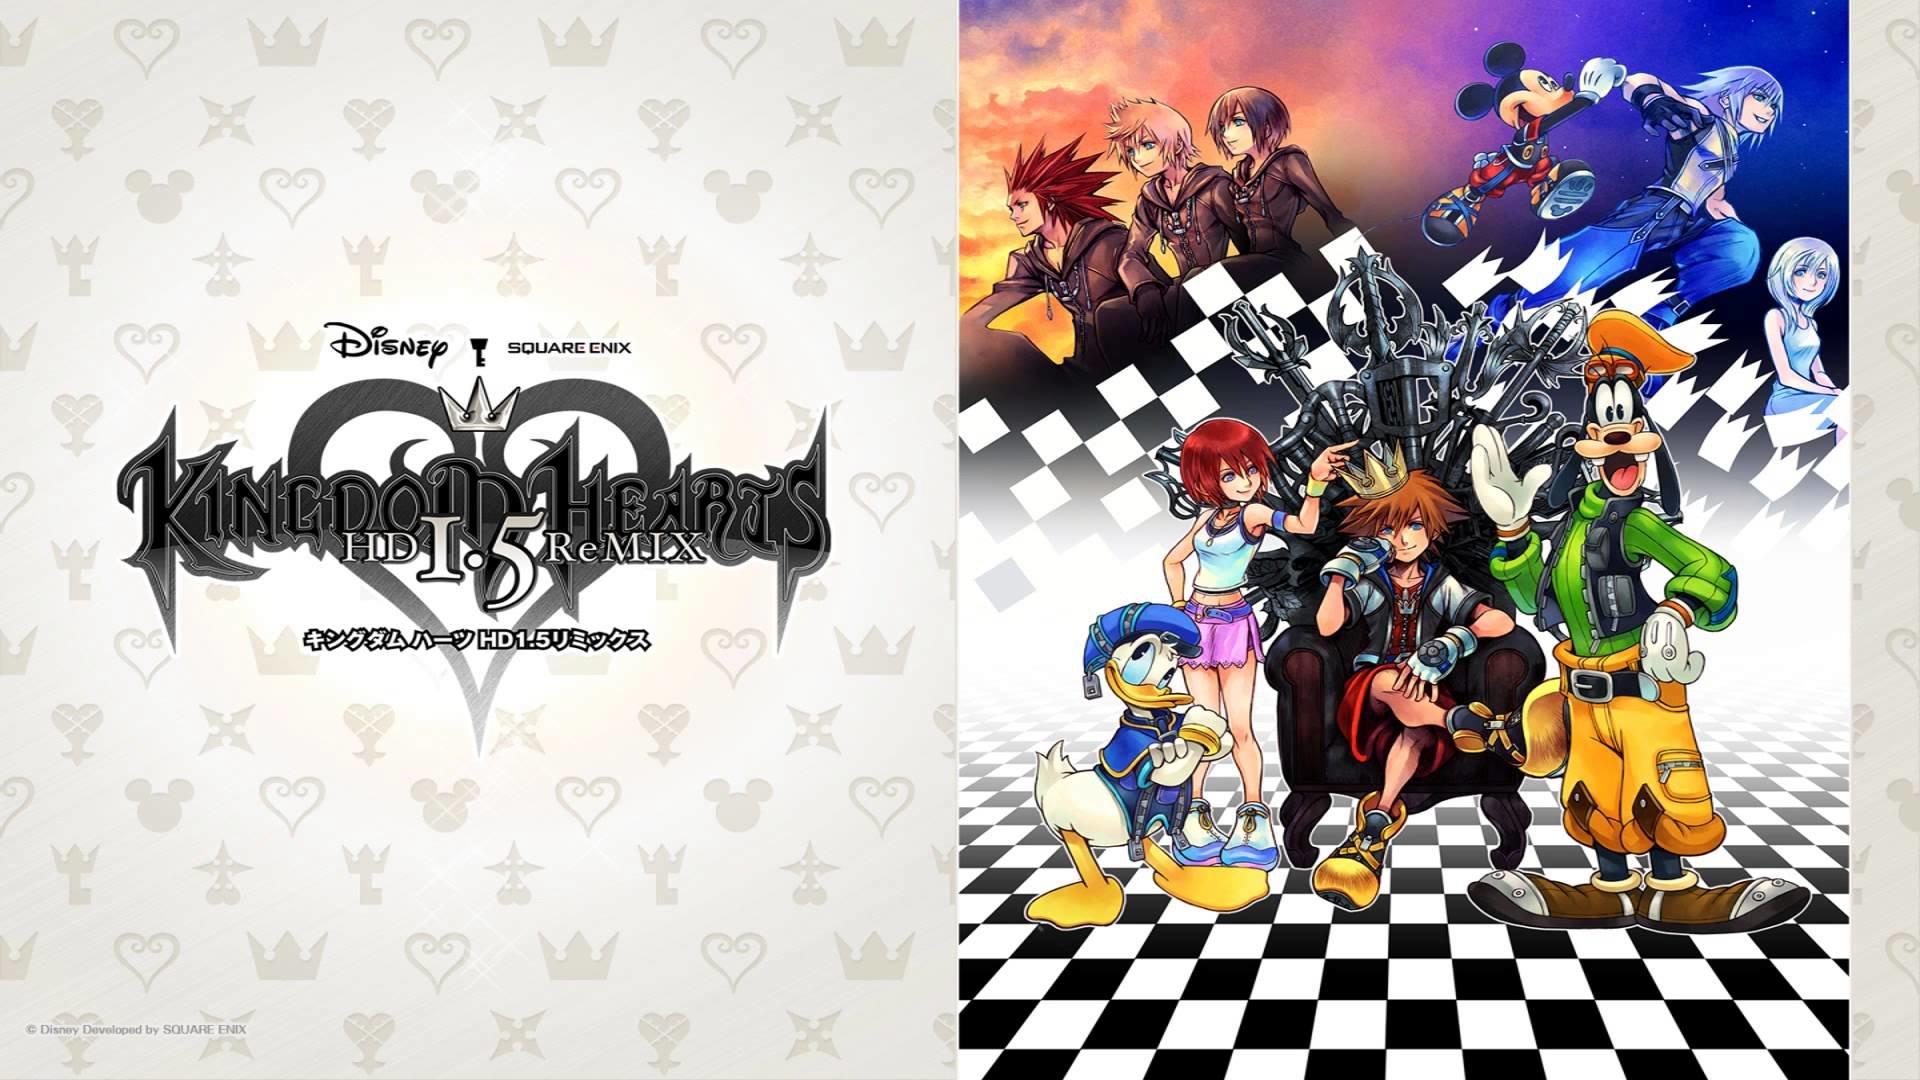 Kingdom Hearts Wallpapers 1920x1080 Full Hd 1080p Desktop